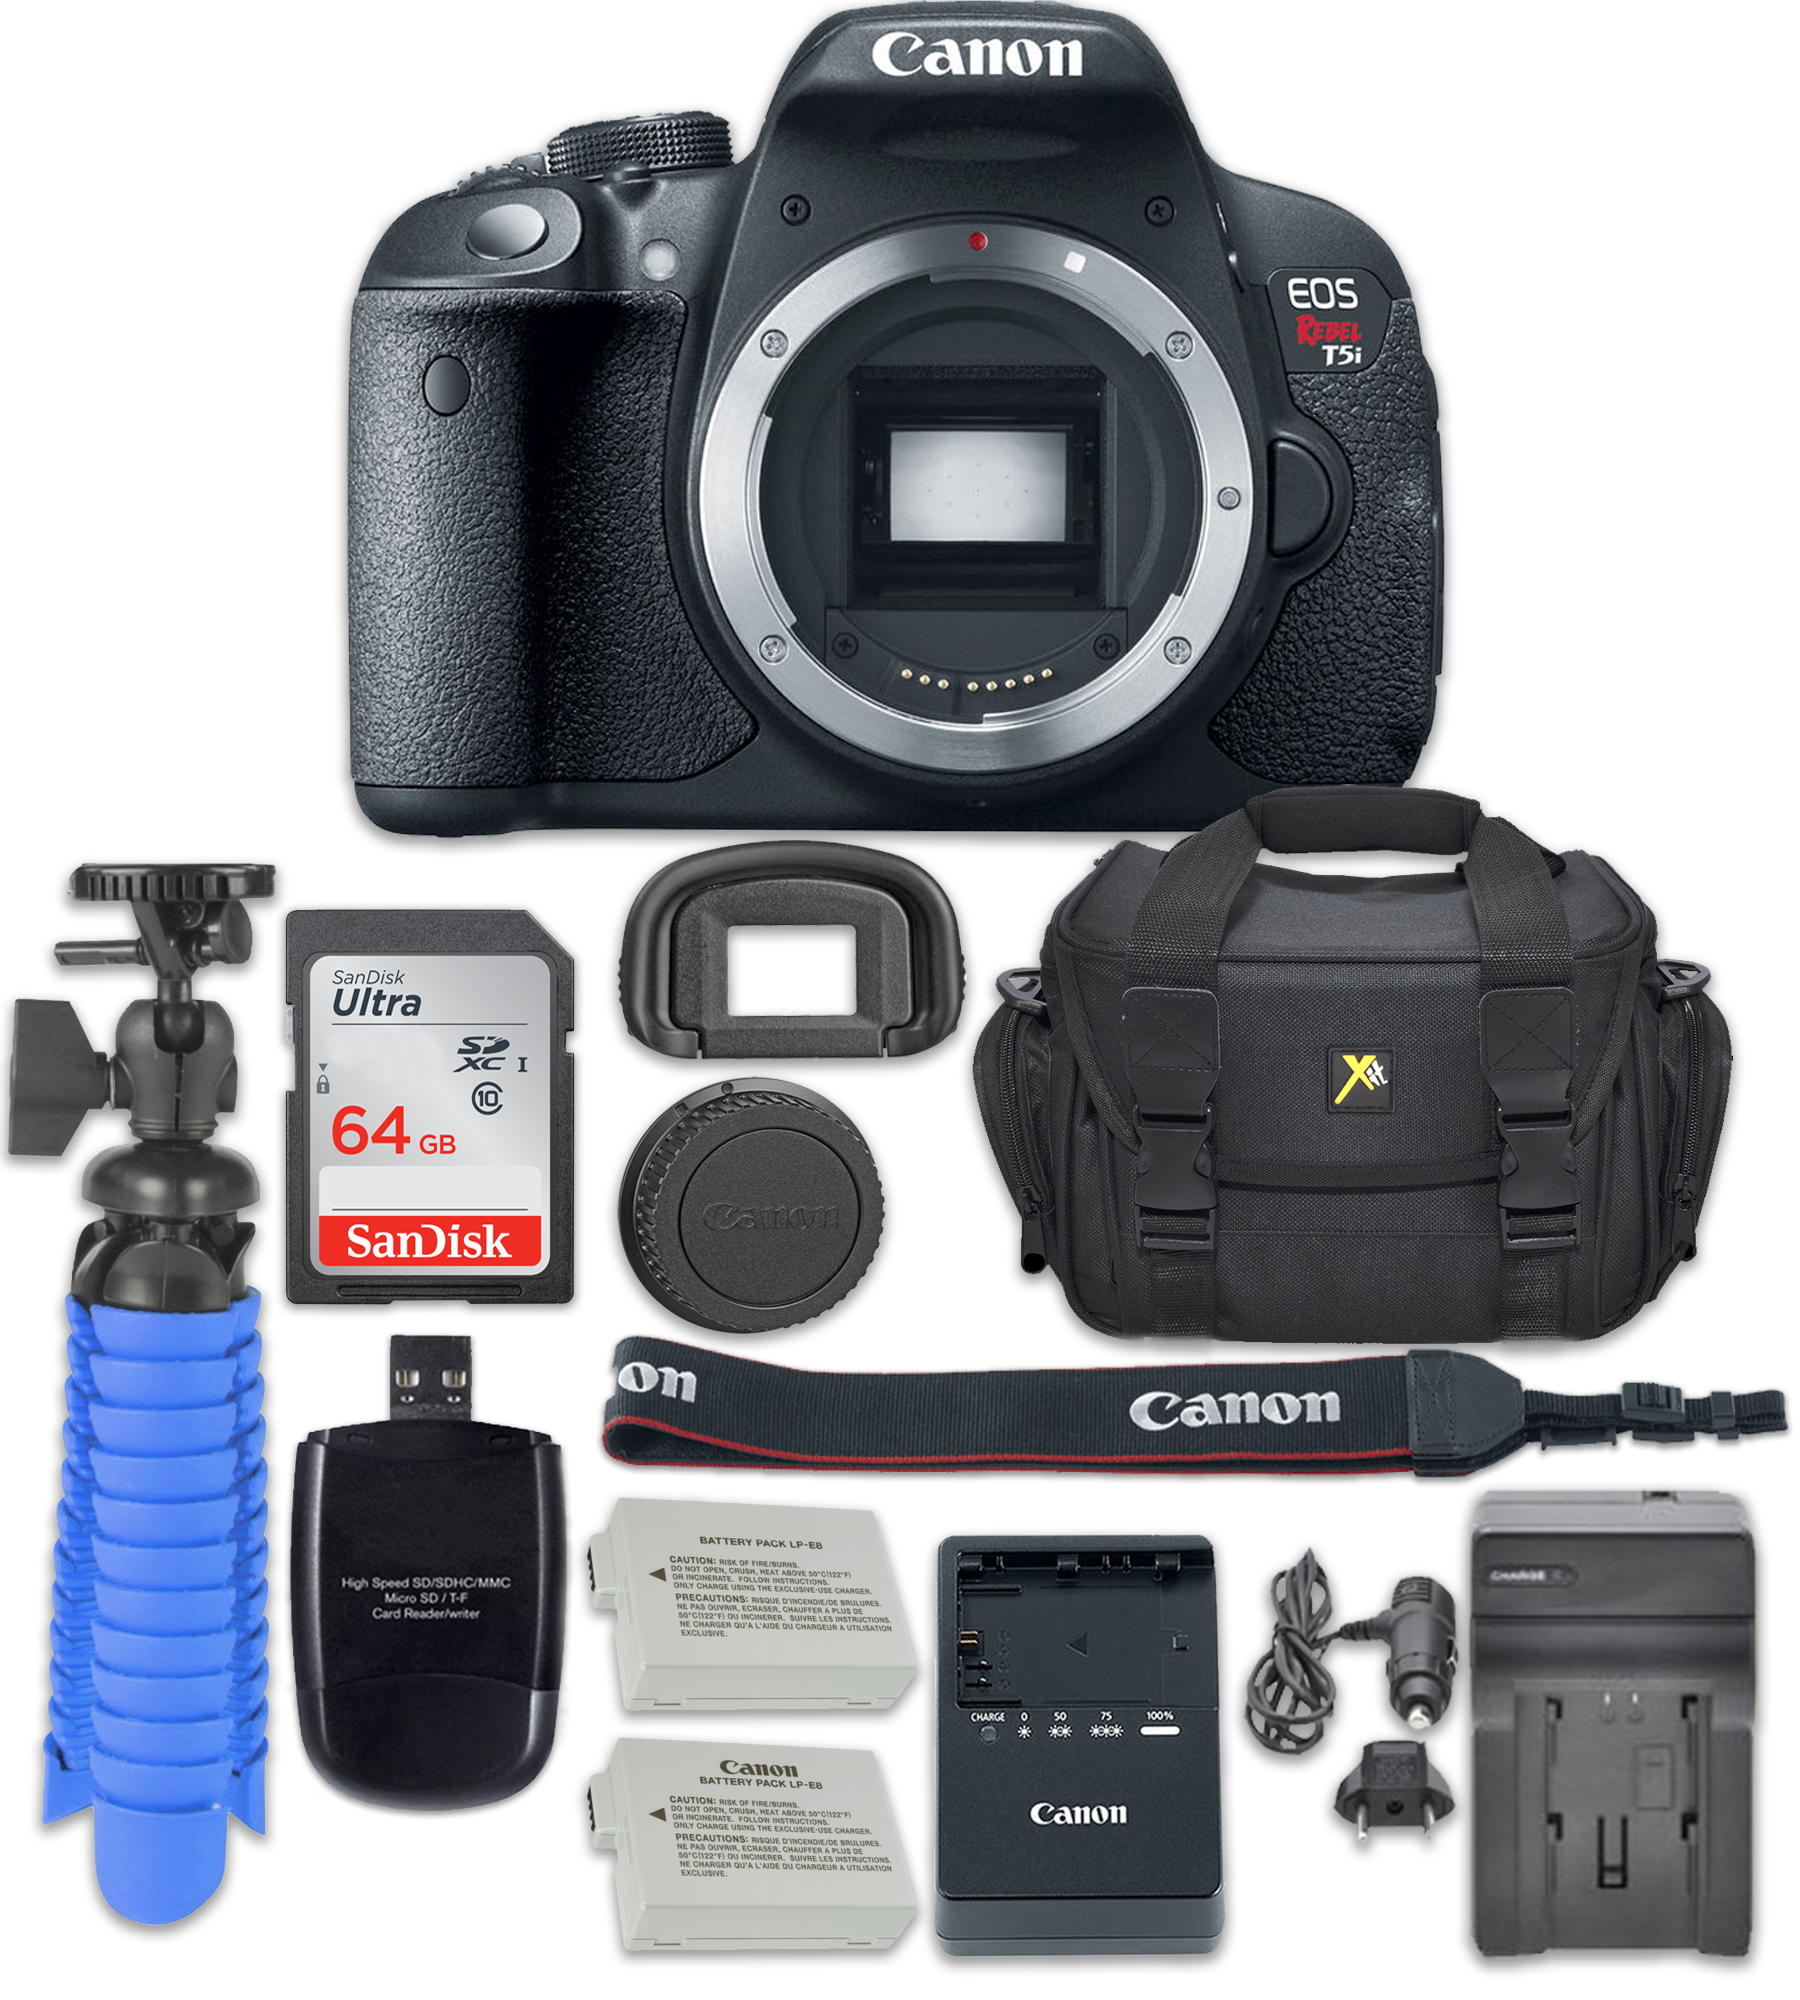 Canon EOS Rebel T5i Digital SLR Camera(Body Only) + Accessory Kit